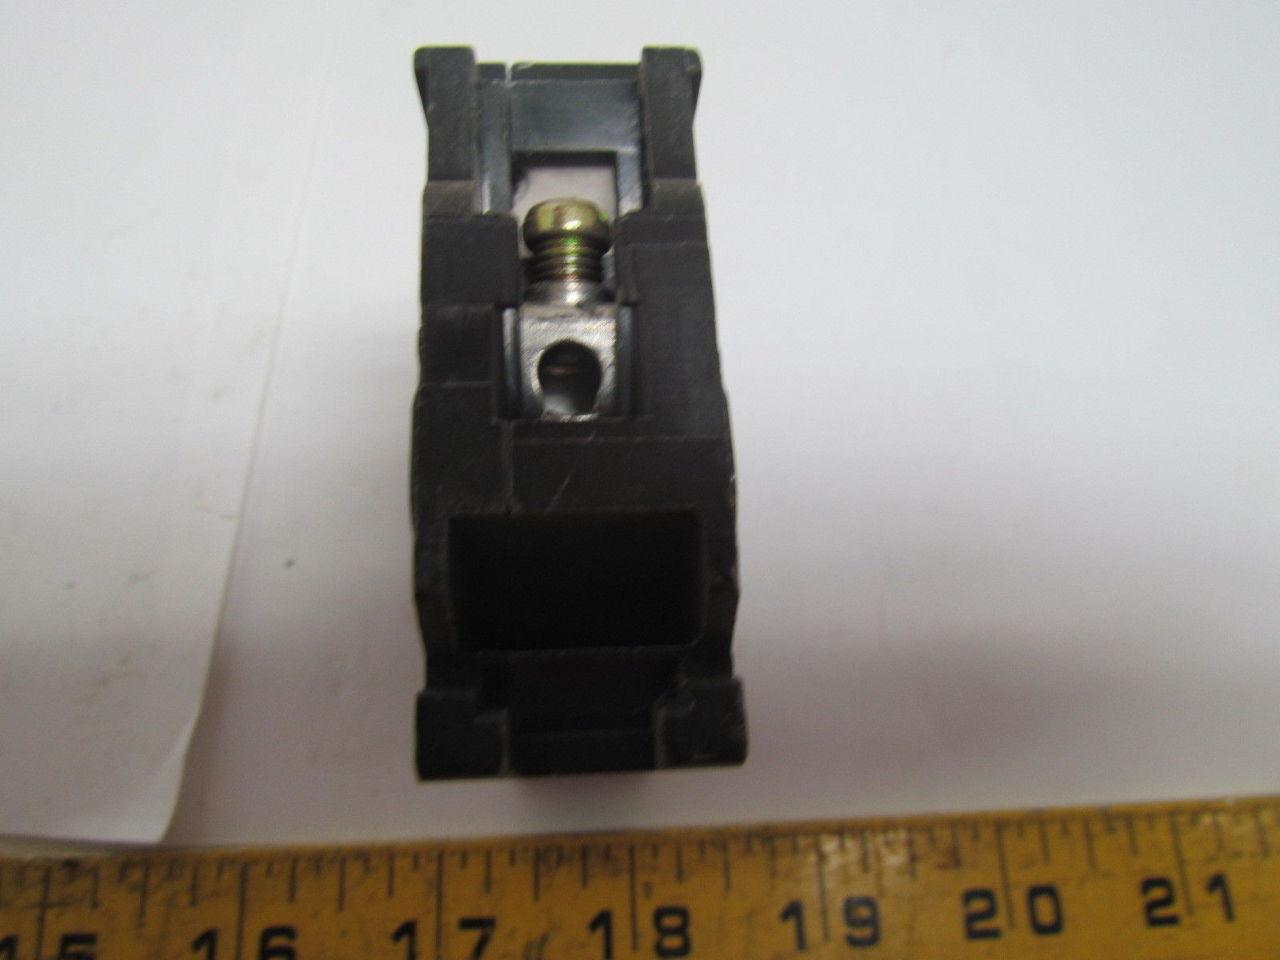 v gfci breaker wiring diagram wiring diagram 3 wire 240v gfci breaker wiring